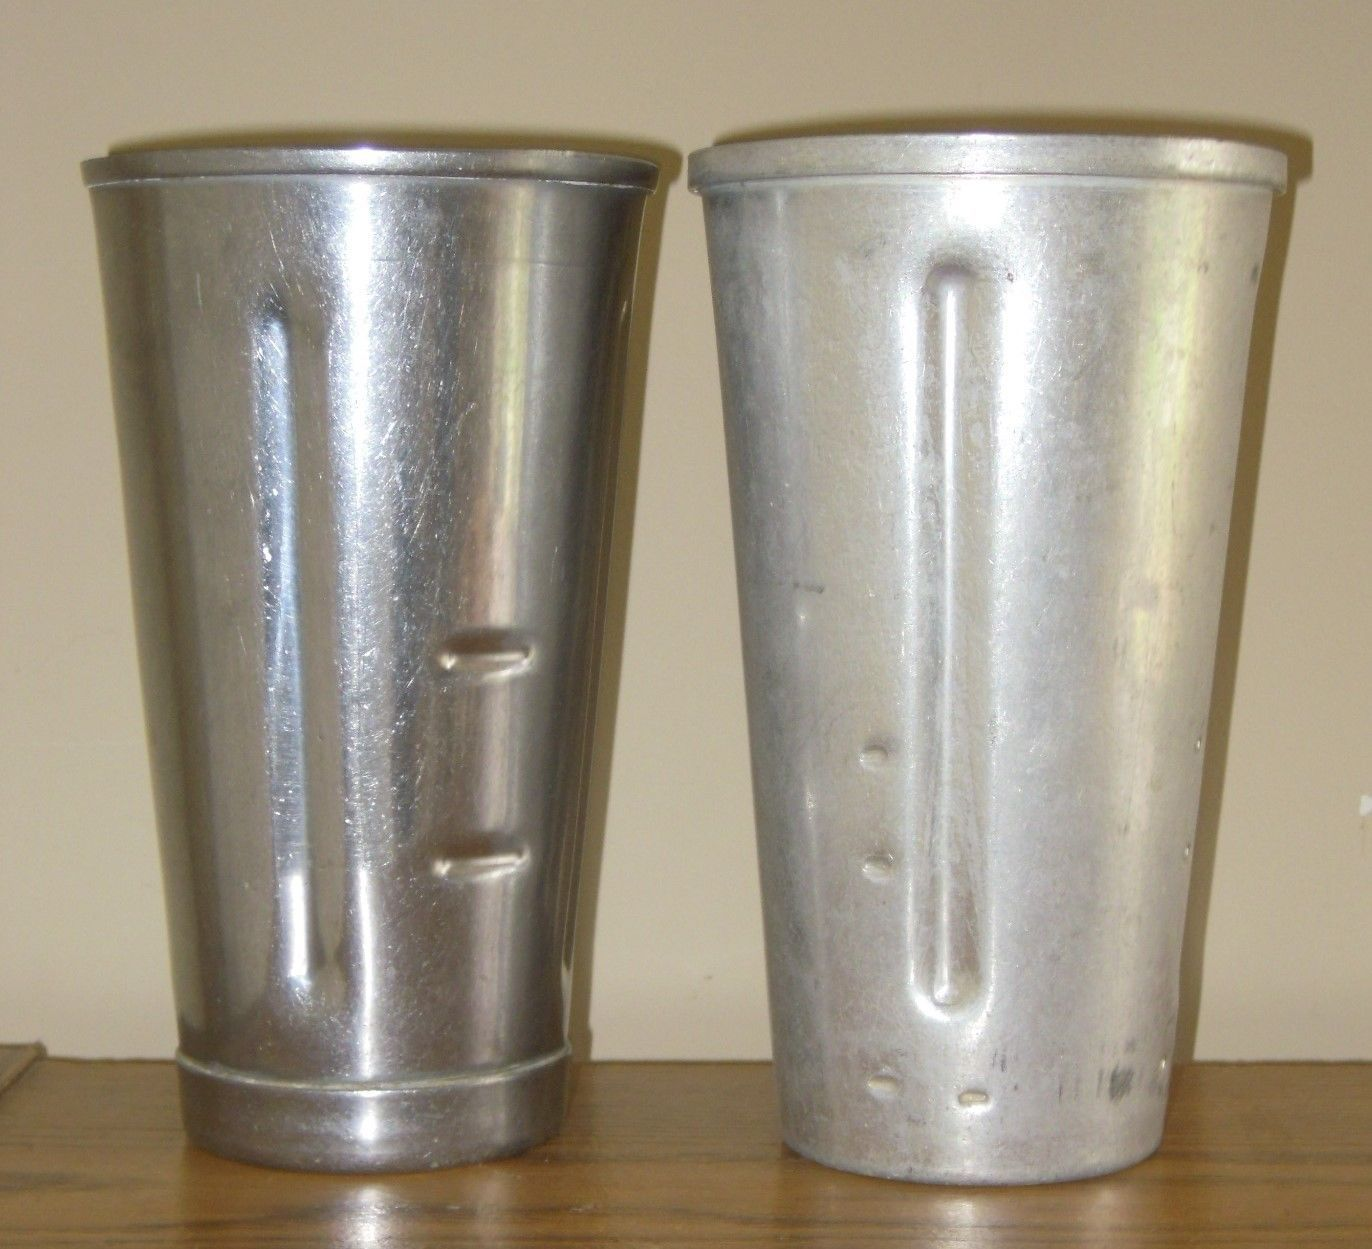 2 VINTAGE Wear Ever & Craft STAINLESS STEEL Aluminum  MILKSHAKE MIXER CUP - $12.99